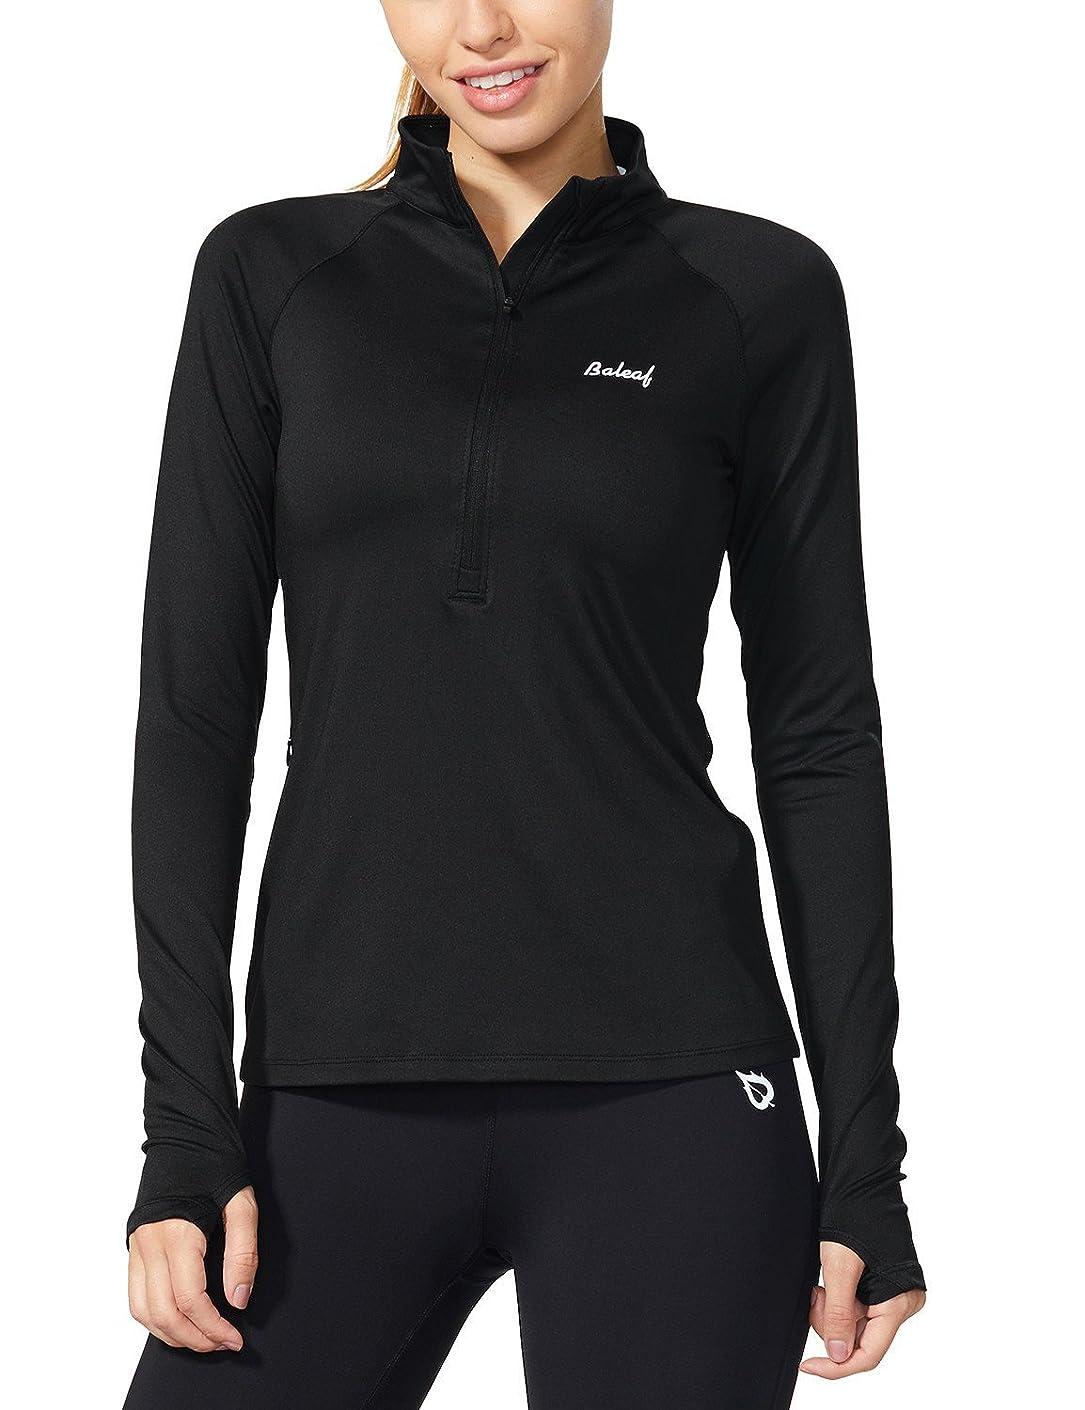 Baleaf Women's Half Zip Pullover Quick Dry Running Top with Thumbholes dczzgjp41